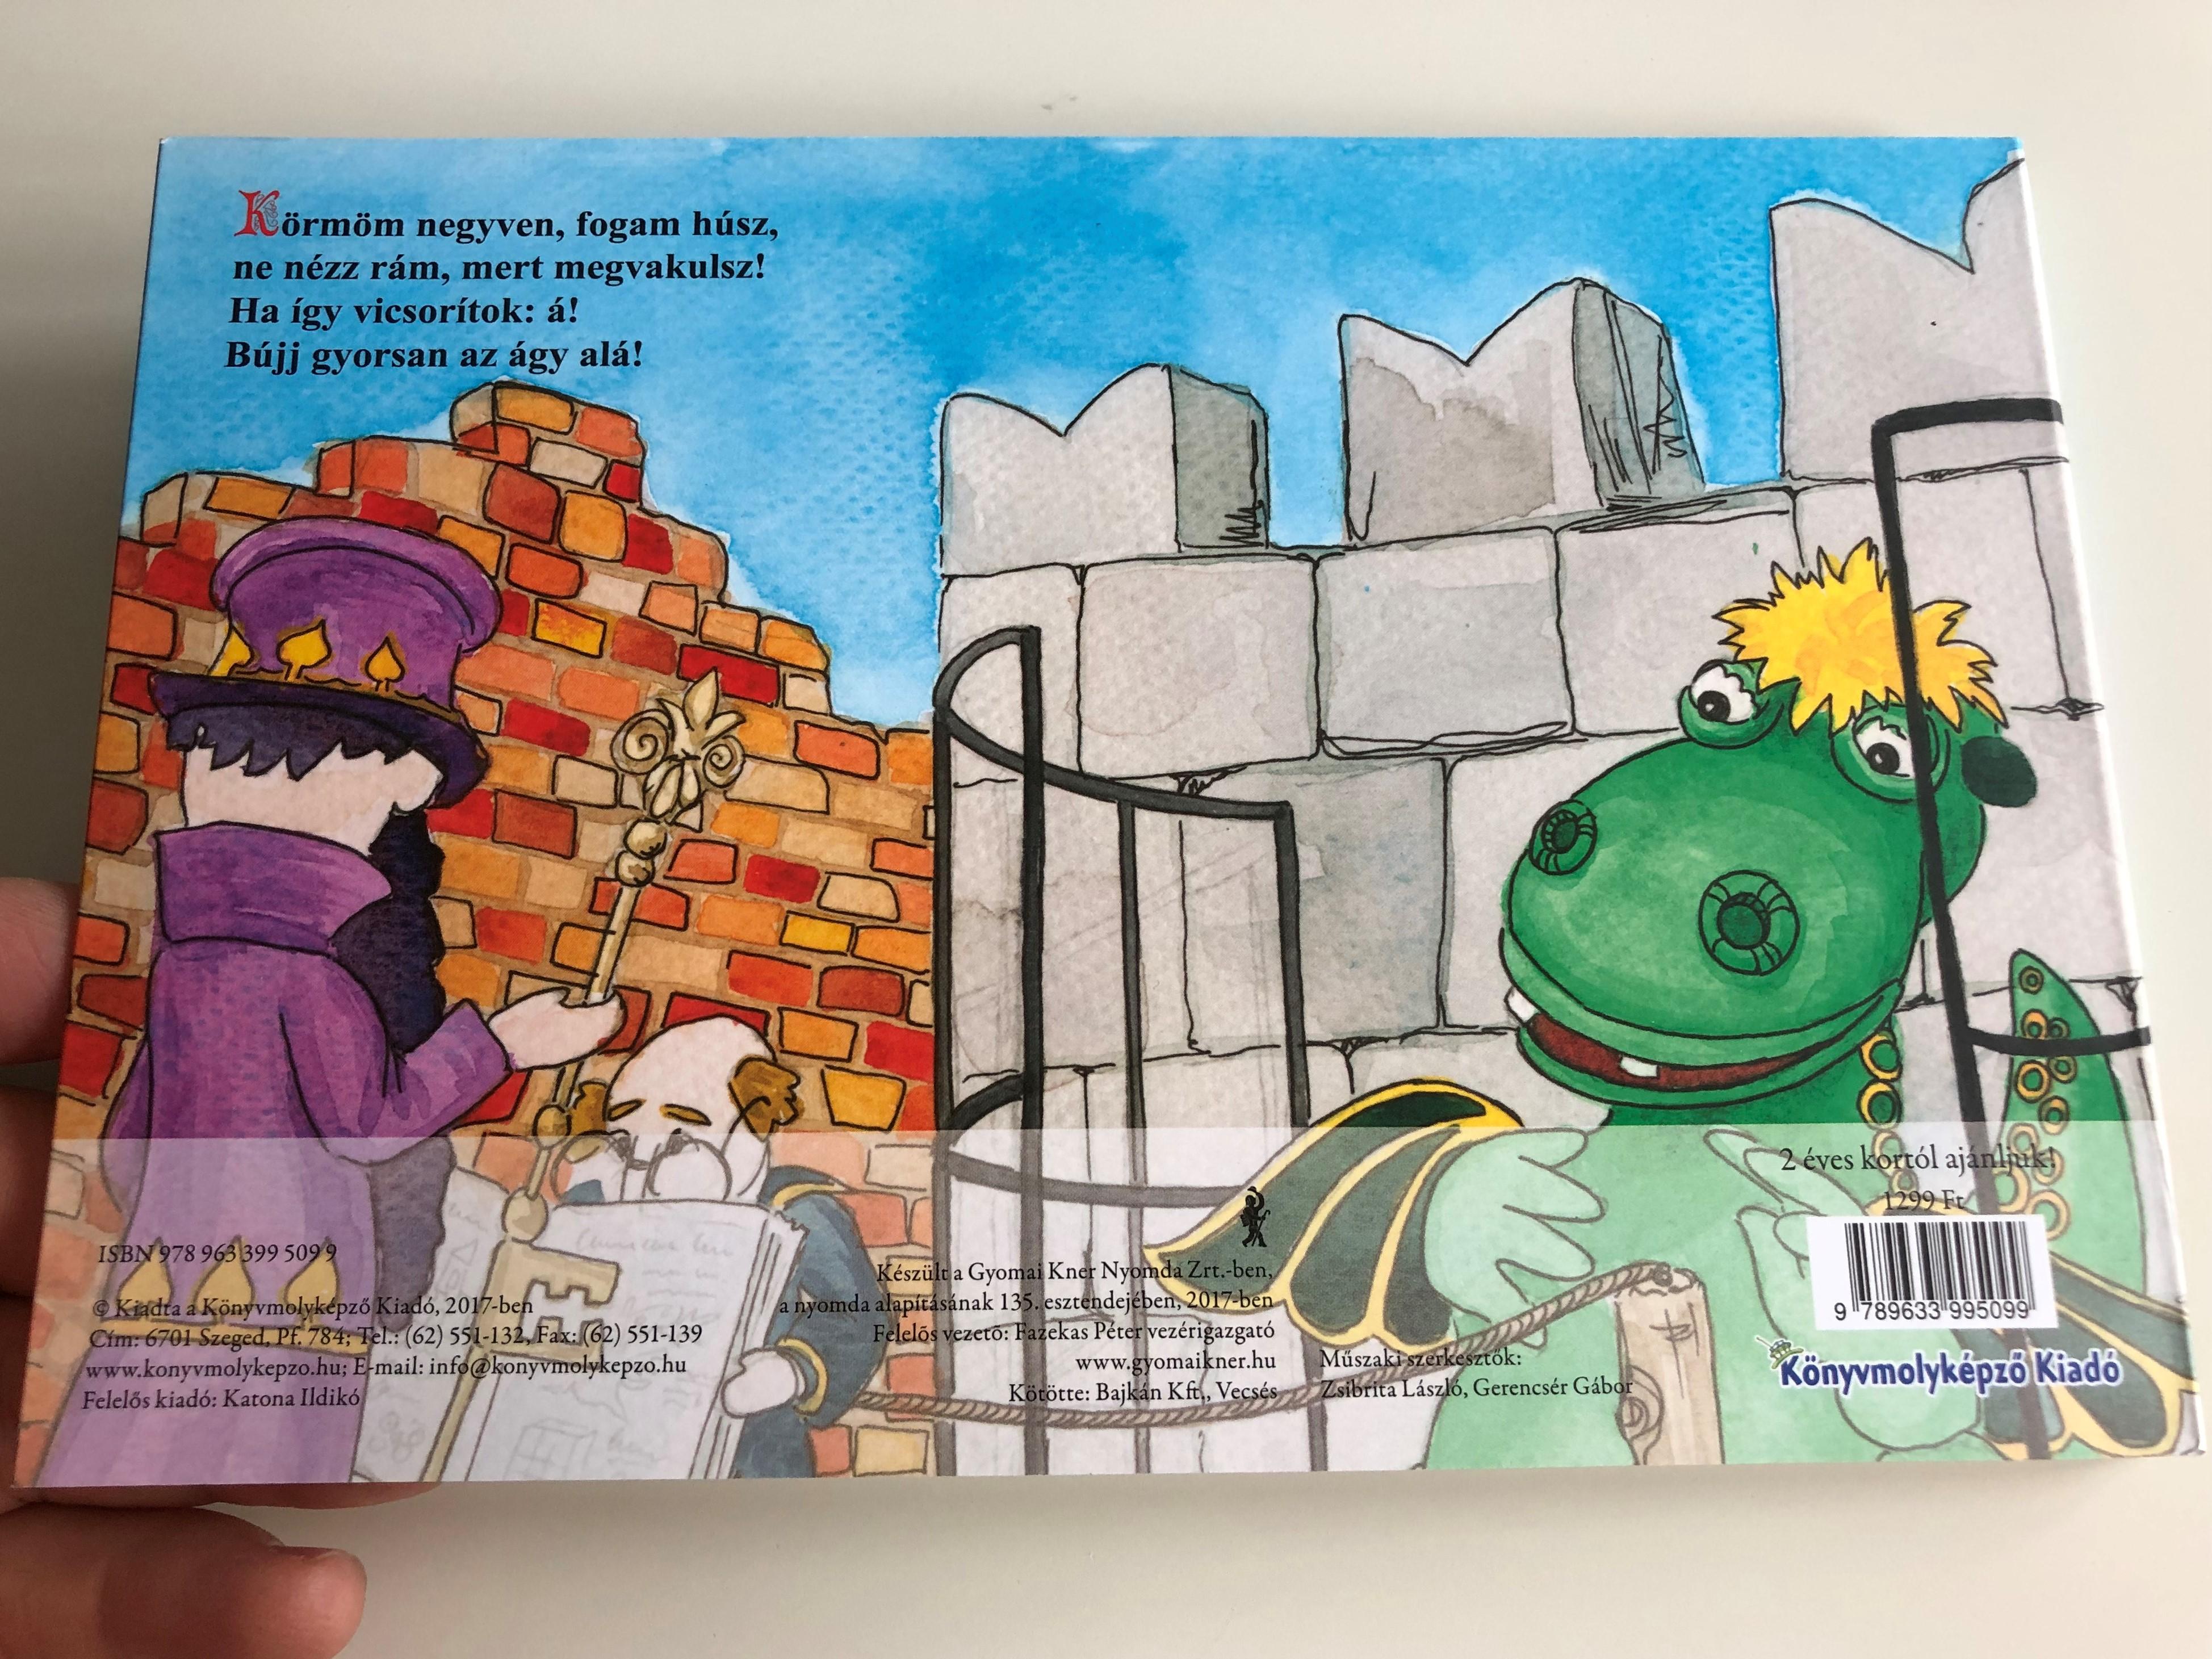 csuk-s-istv-n-s-s-a-s-rk-ny-i.-sz-nes-lapoz-2-ves-kort-l-s-s-the-dragon-hungarian-children-s-color-board-book-2017-k-nyvmolyk-pz-kiad-6-.jpg